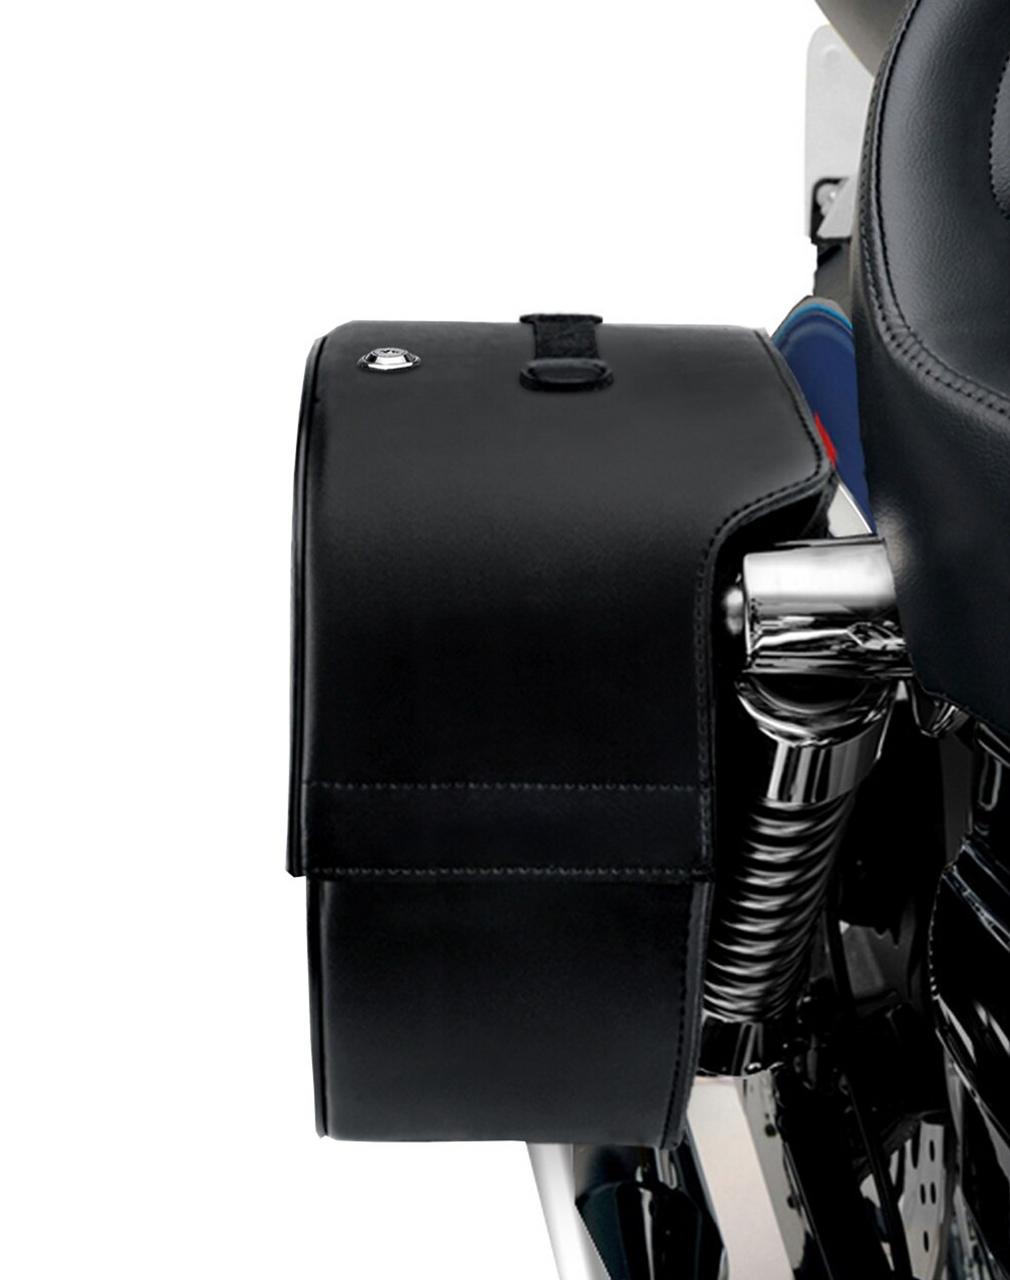 VikingBags Armor Large Single Strap Shock Cutout Honda Shadow Aero ABS VT750CS Leather Motorcycle Saddlebags Shock Cutout View